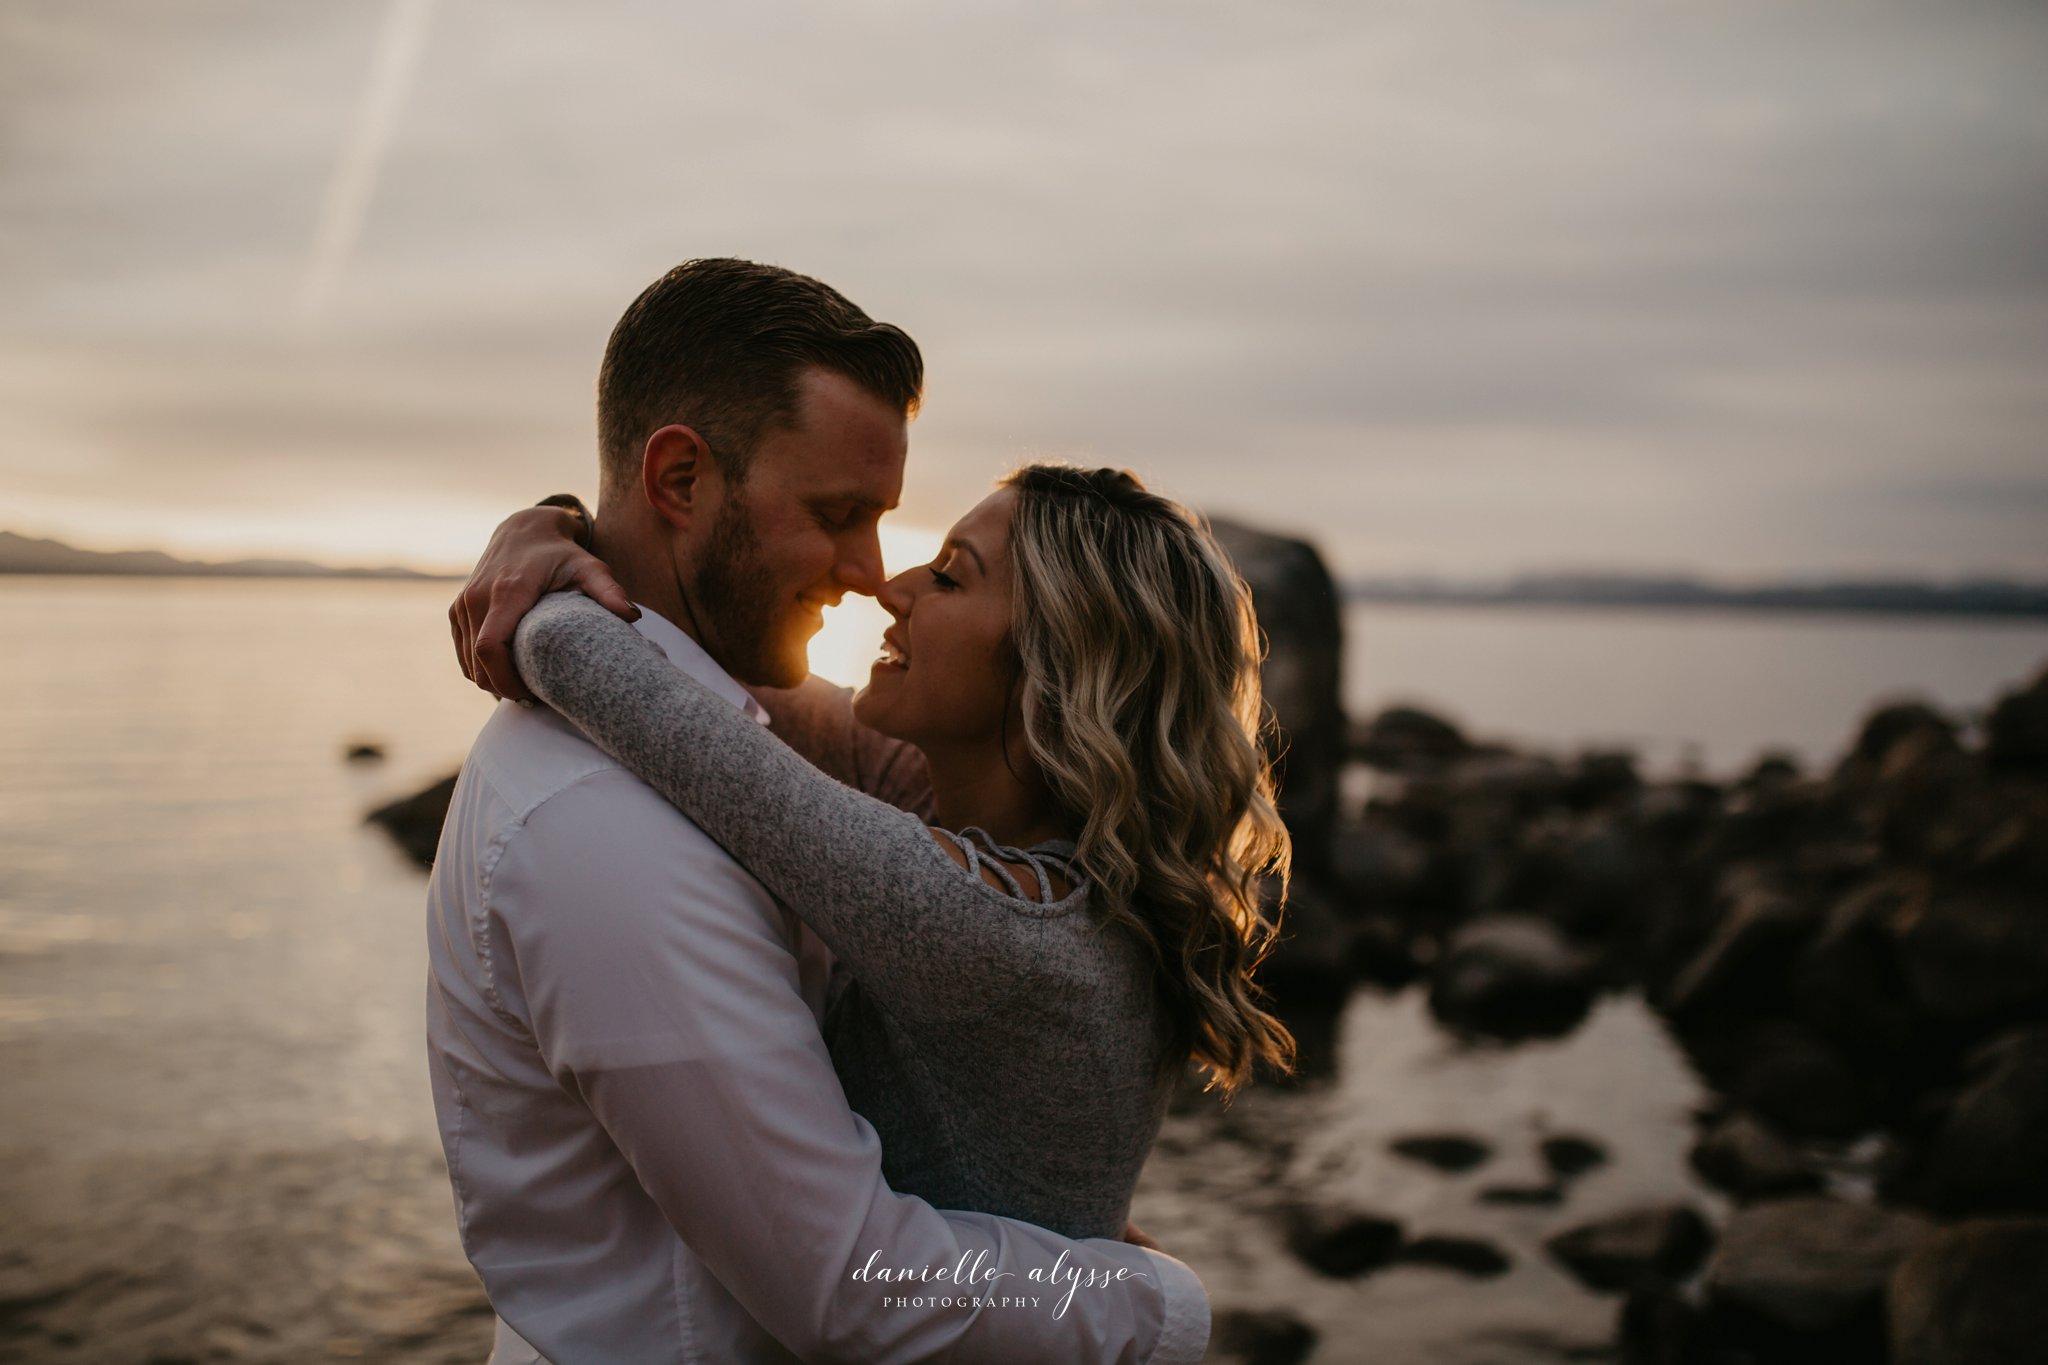 181226_engagement_brittney_fred_tahoe_sand_harbor_danielle_alysse_photography_blog_74_WEB.jpg